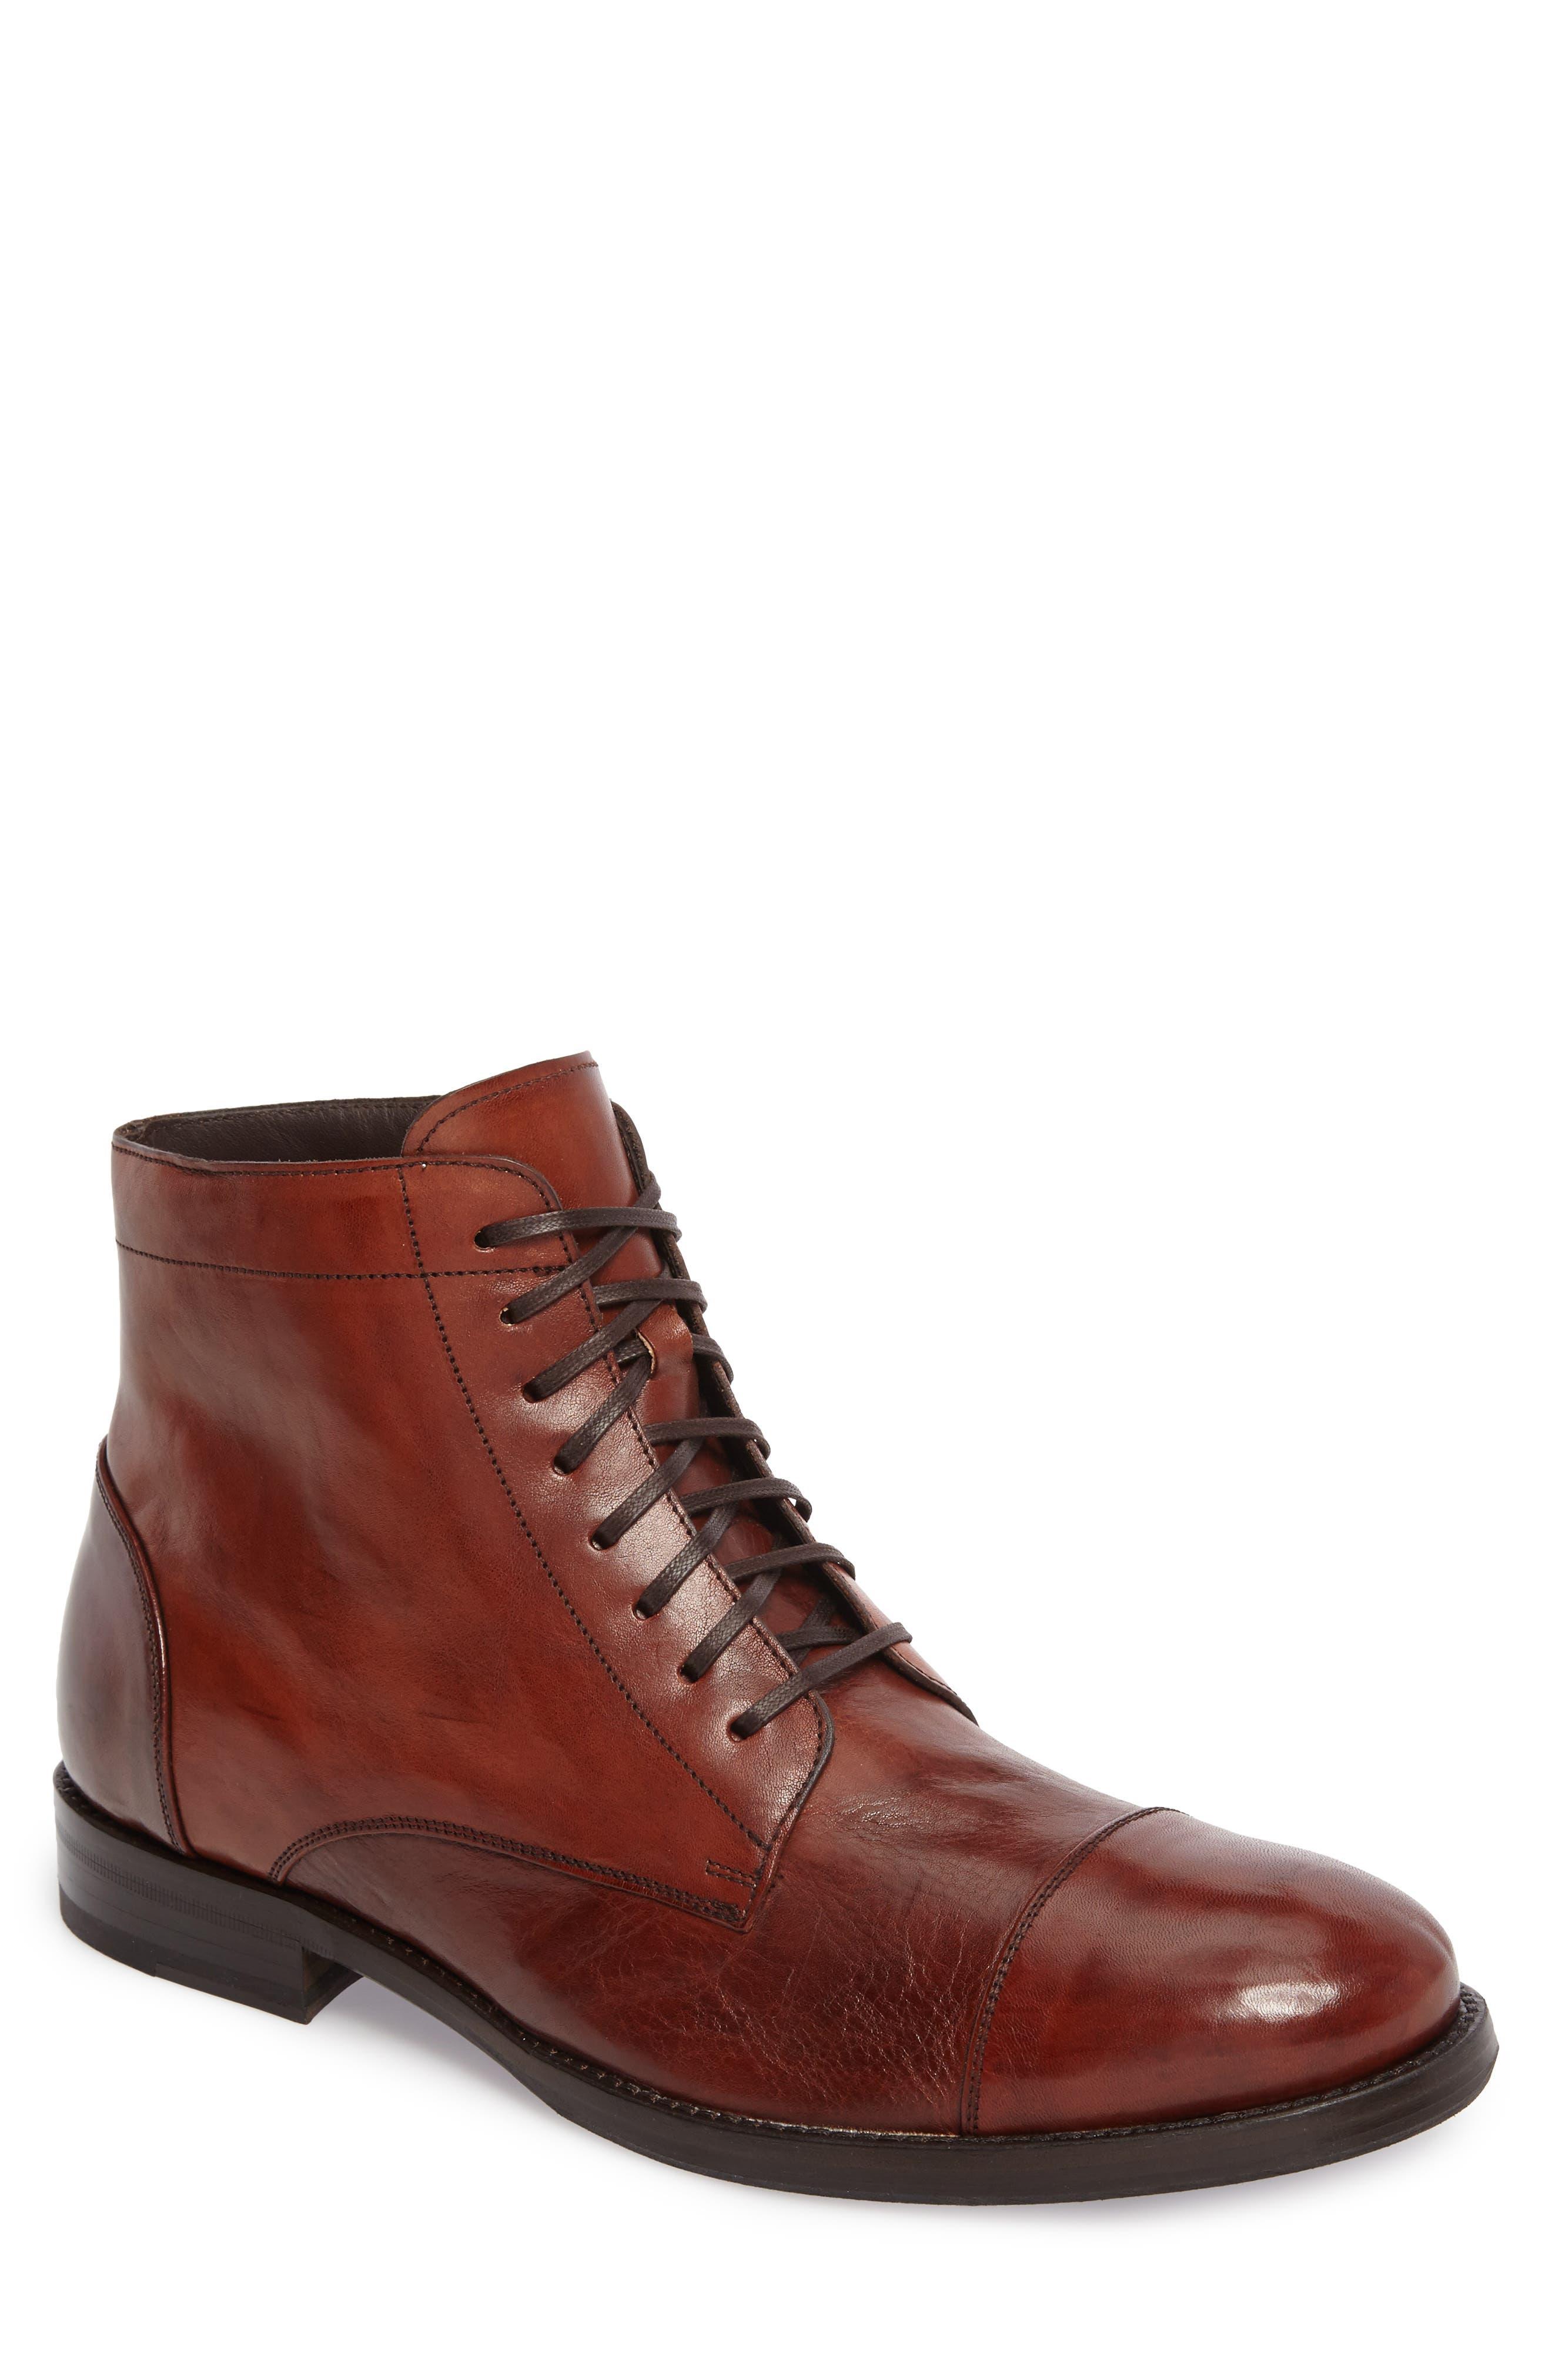 Murcie Cap Toe Boot,                         Main,                         color,